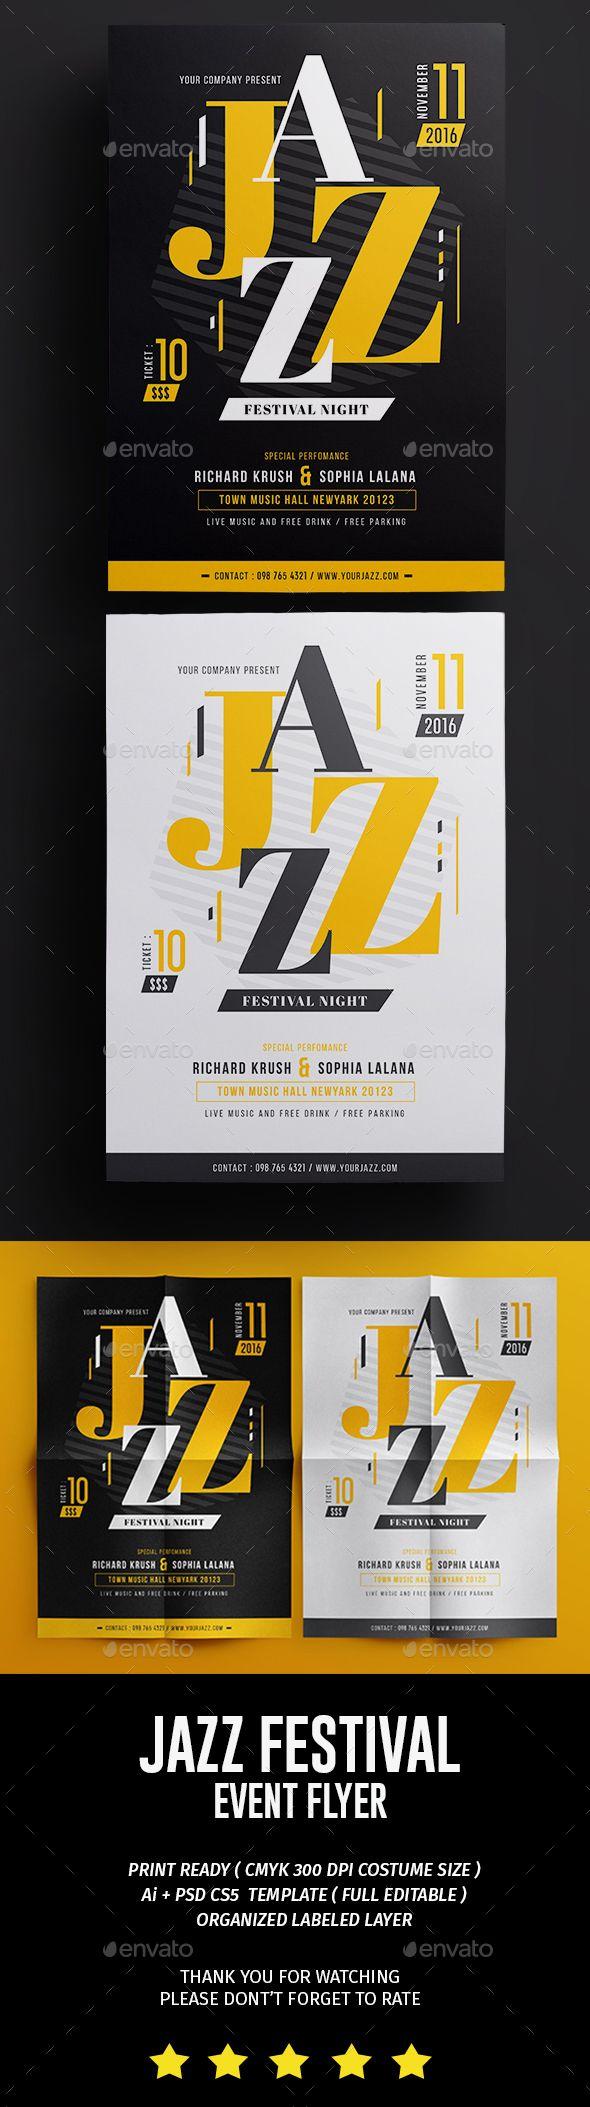 Poster design free - Cannes Lion